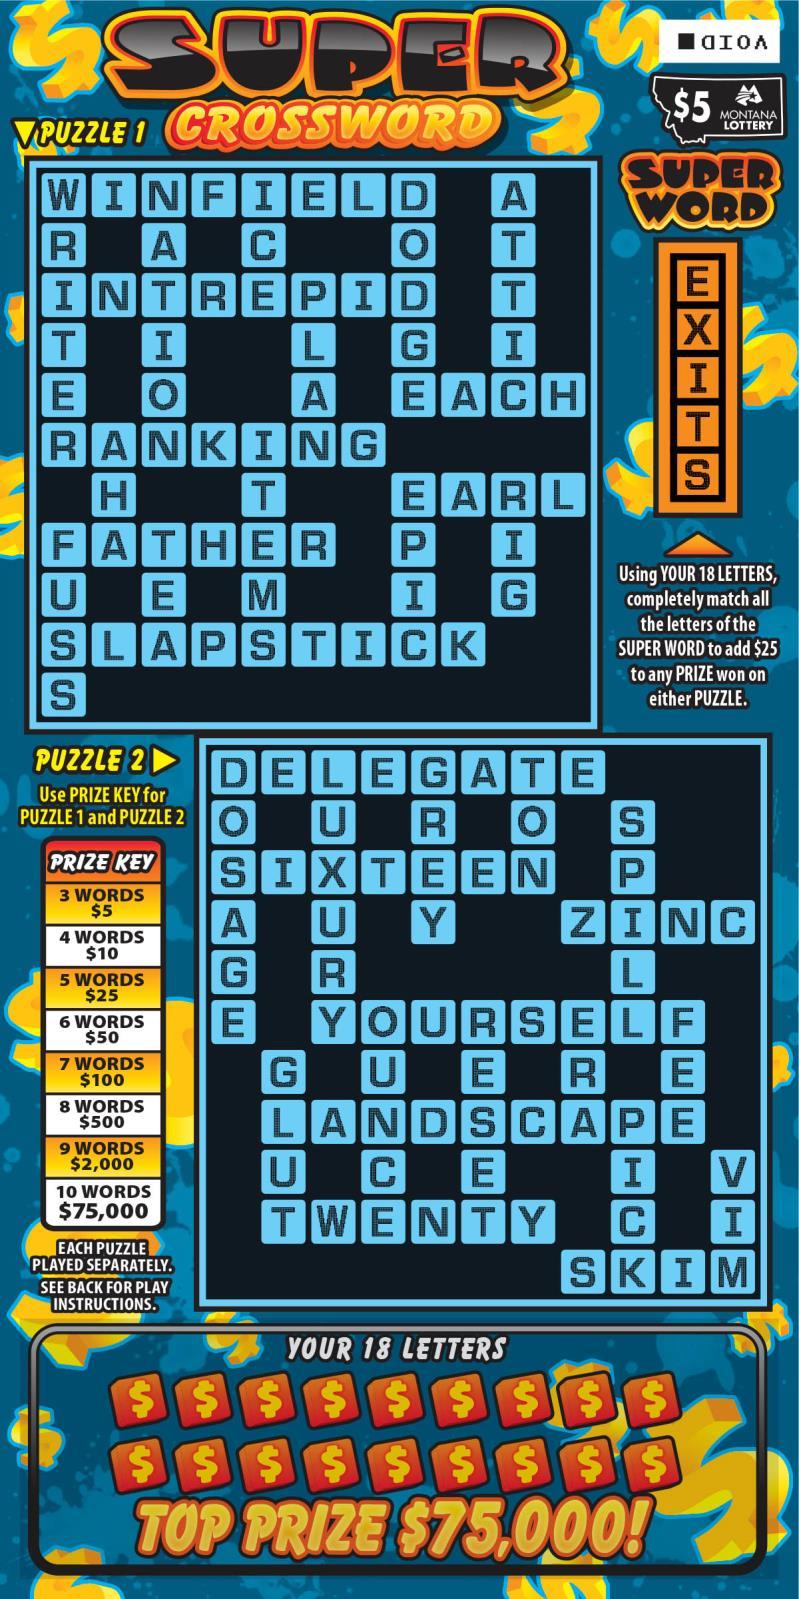 Super Crossword